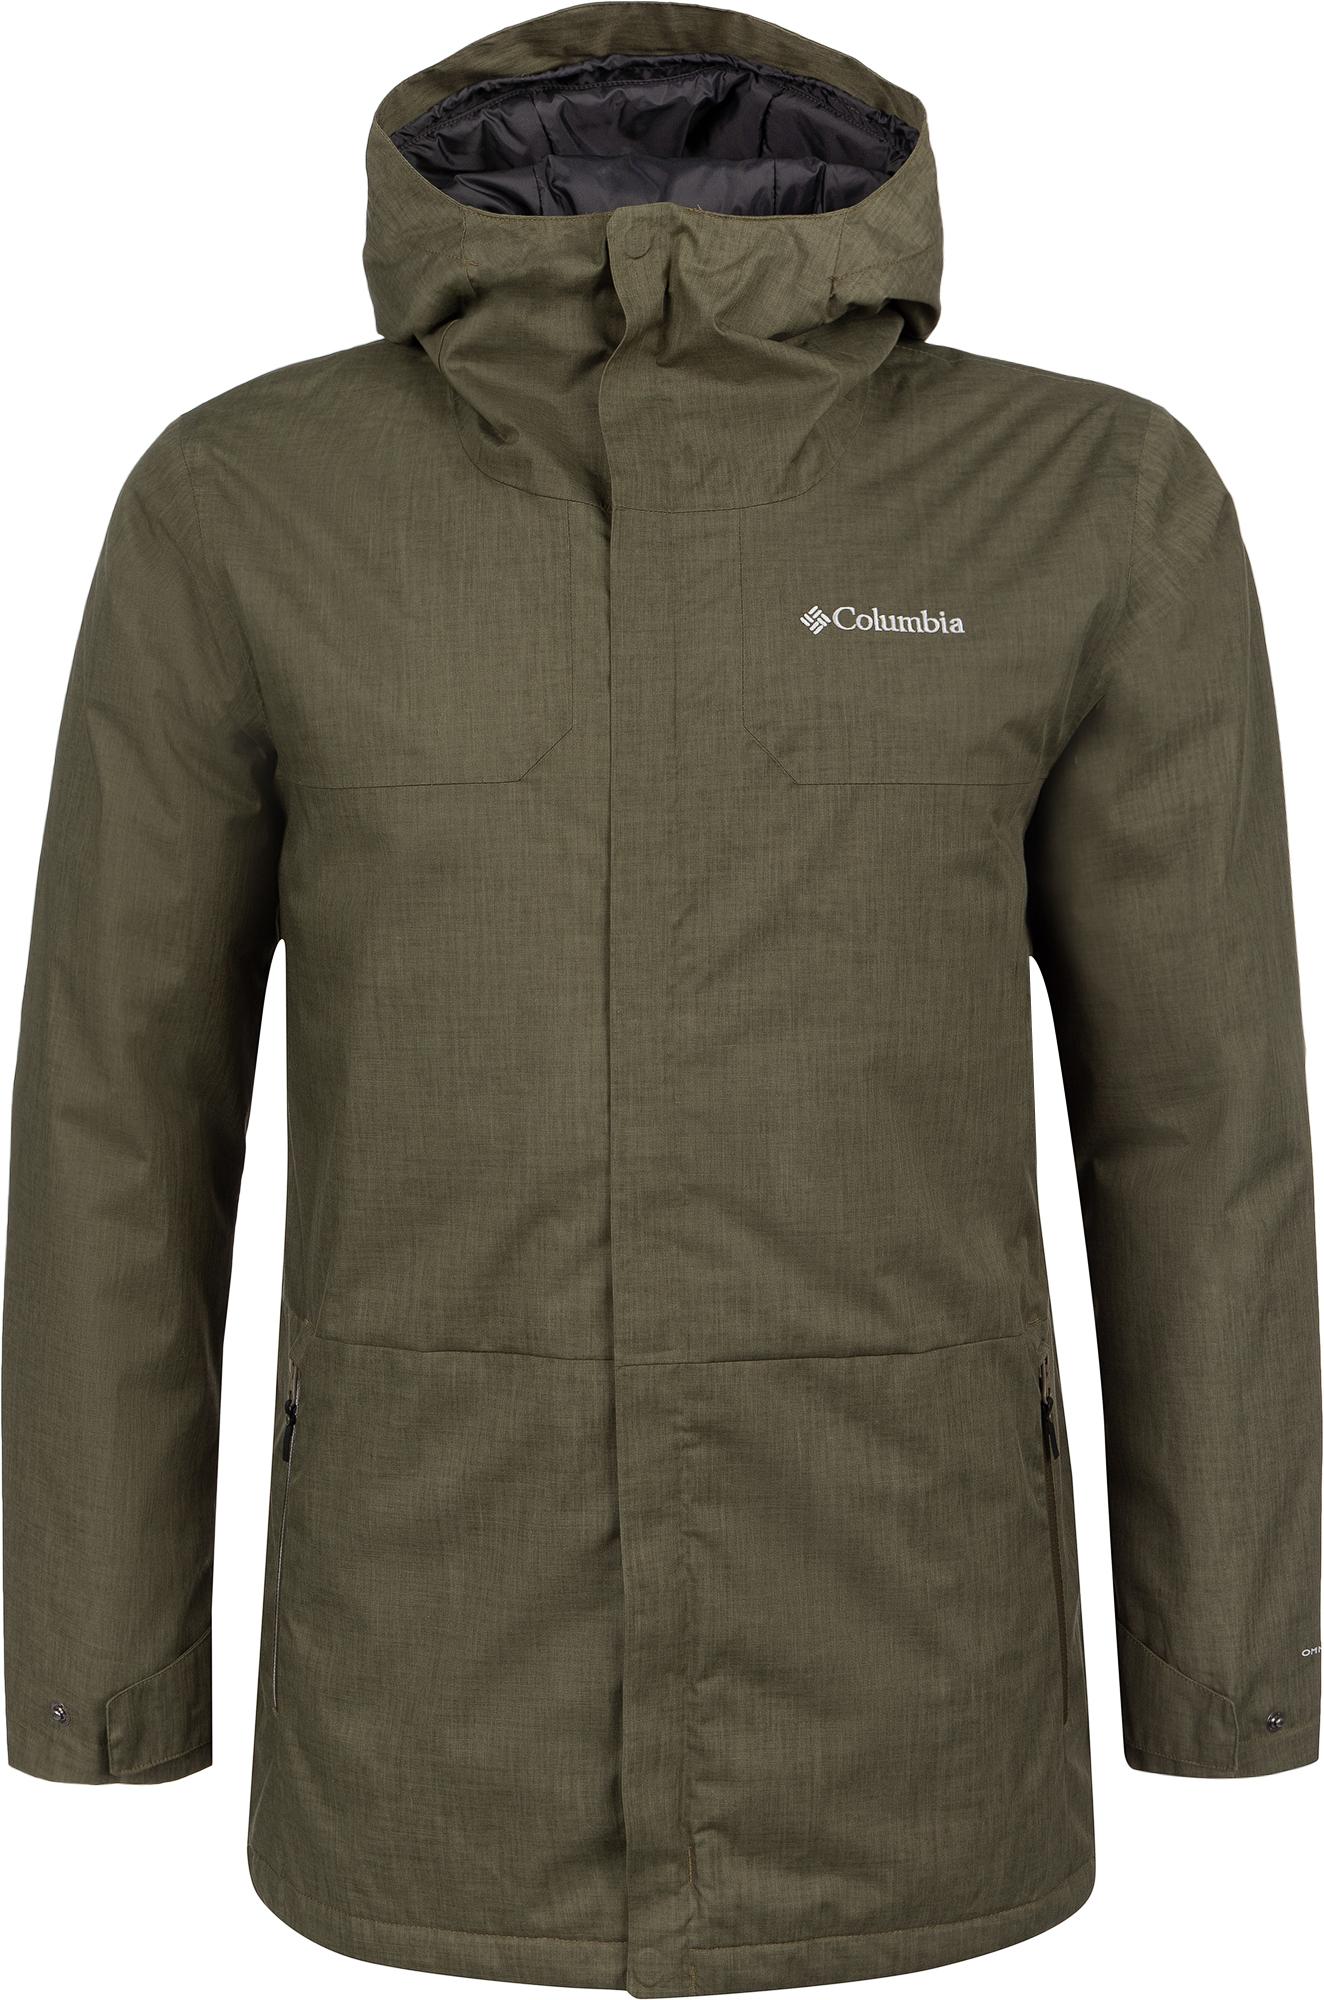 Columbia Куртка утепленная мужская Columbia Rowland Heights, размер 56 columbia куртка утепленная мужская columbia eagles call